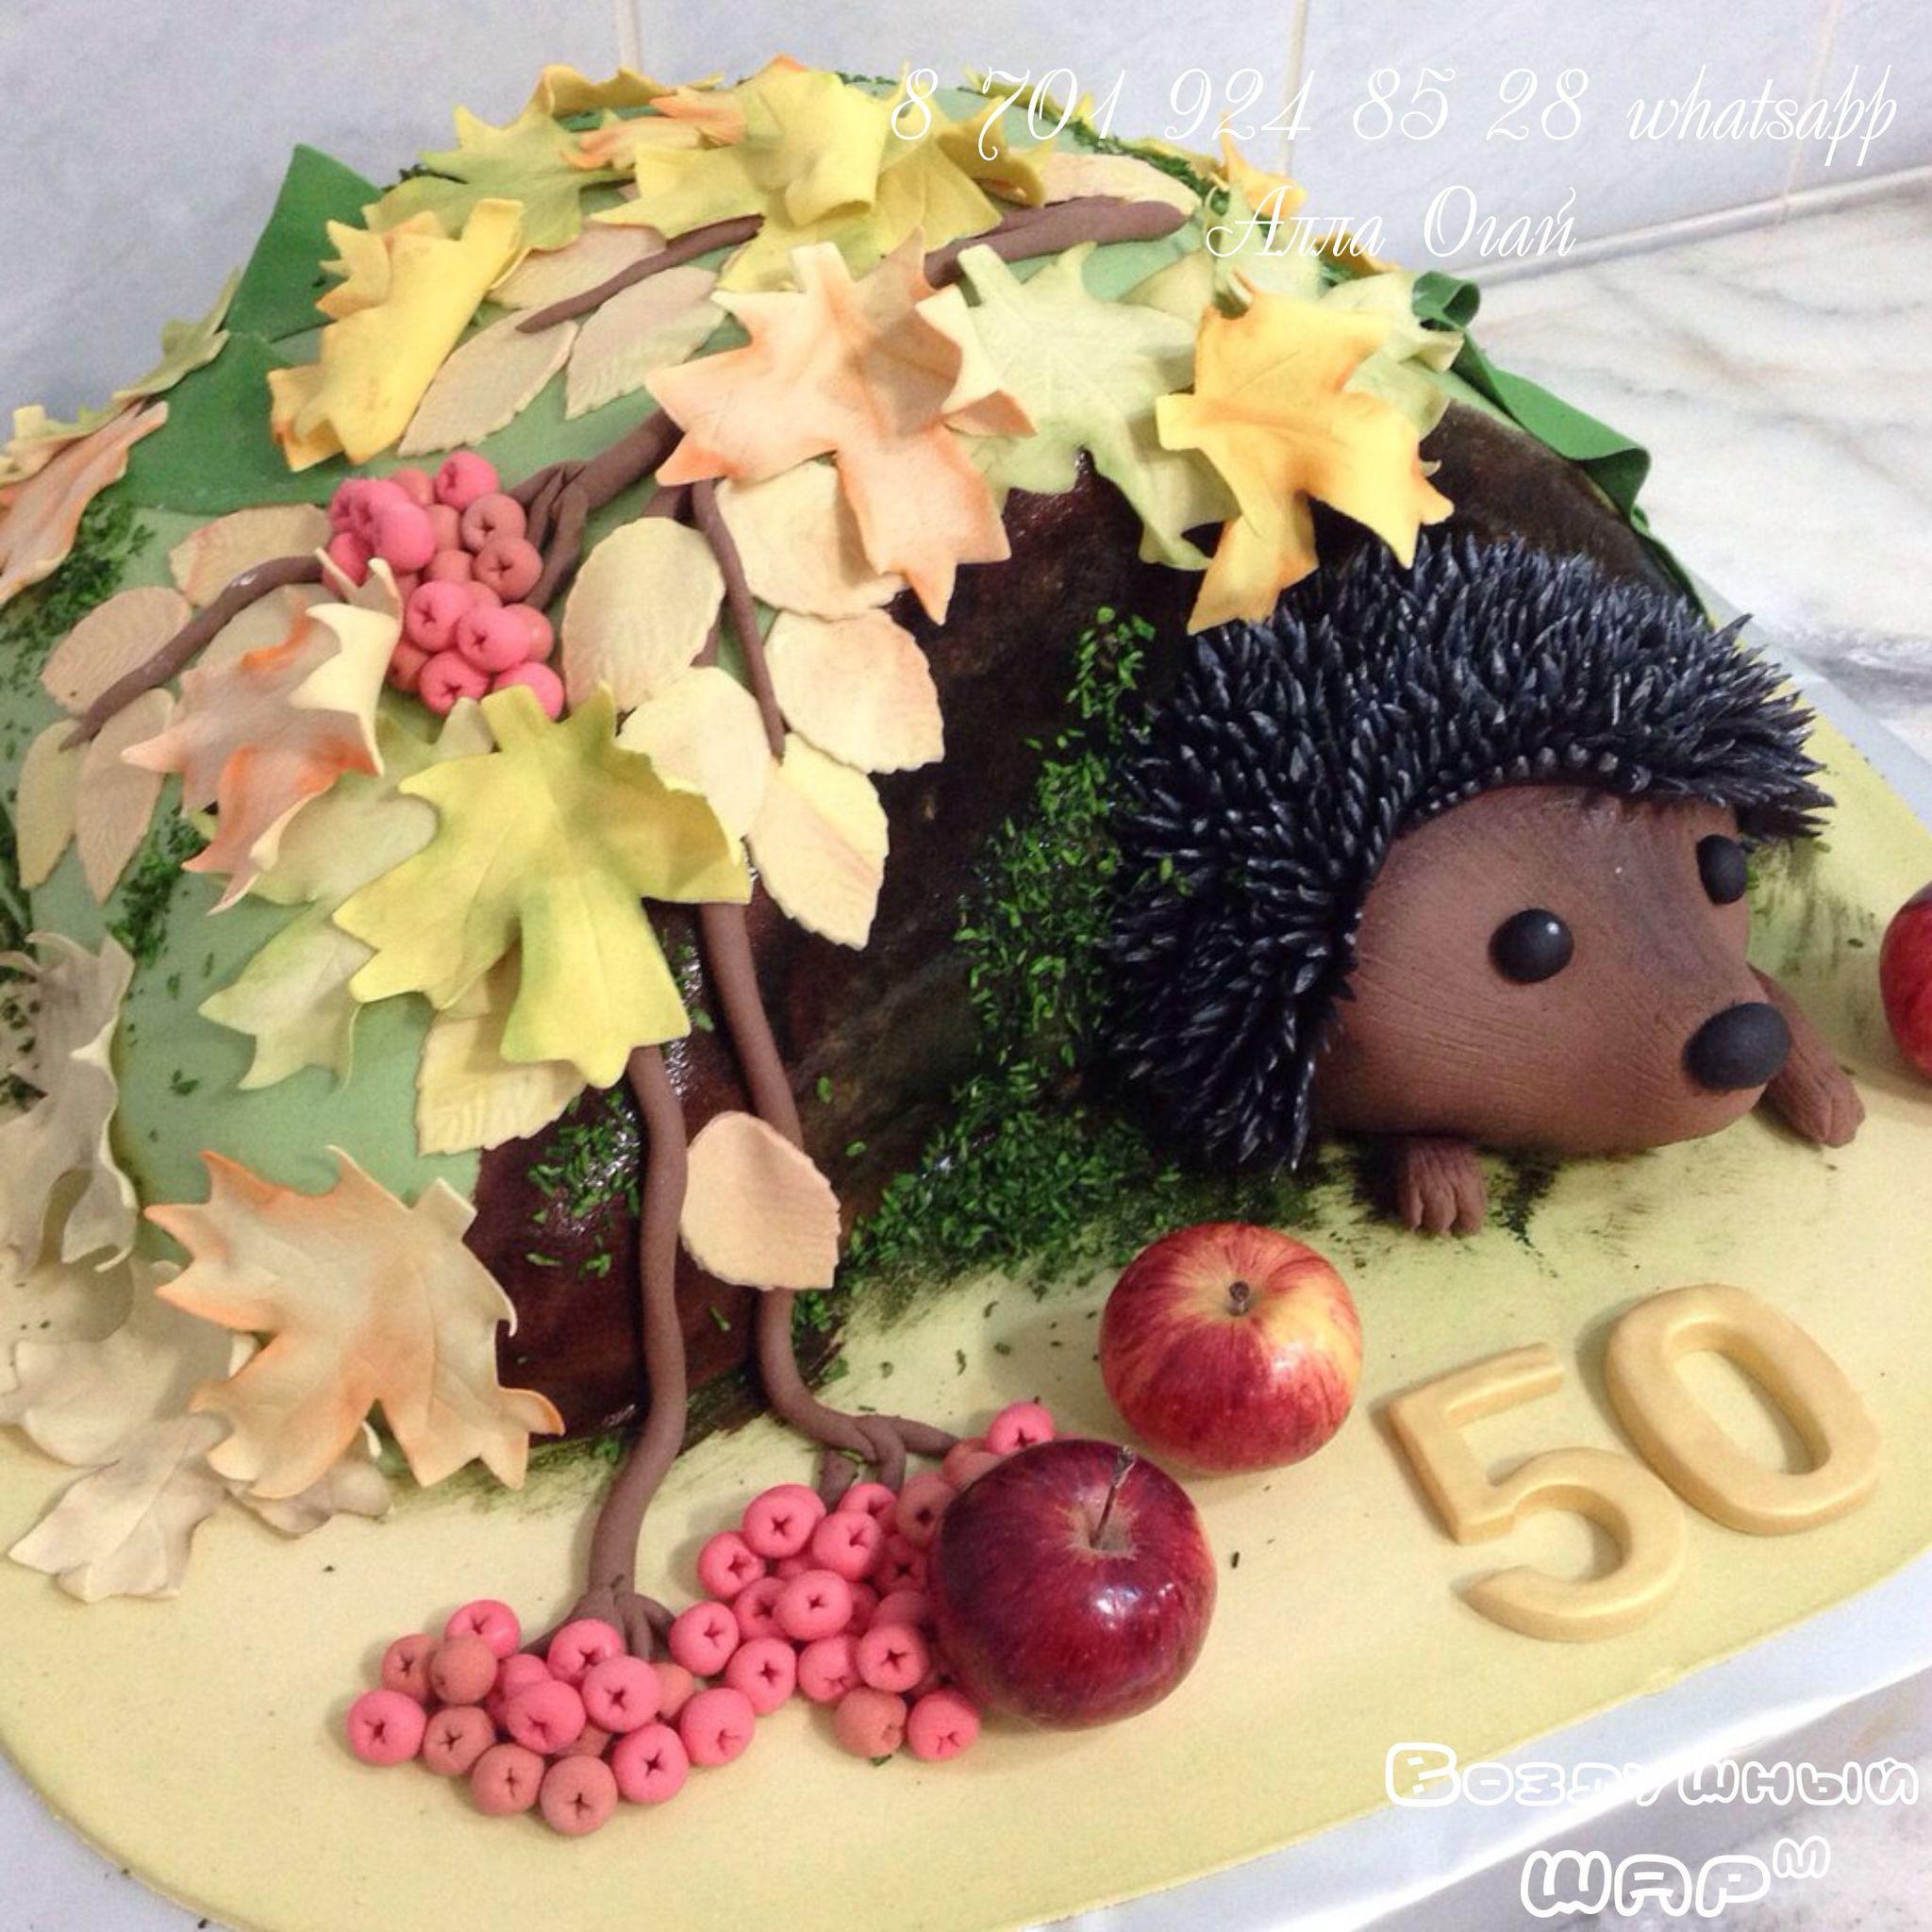 юбилейный торт Алматы